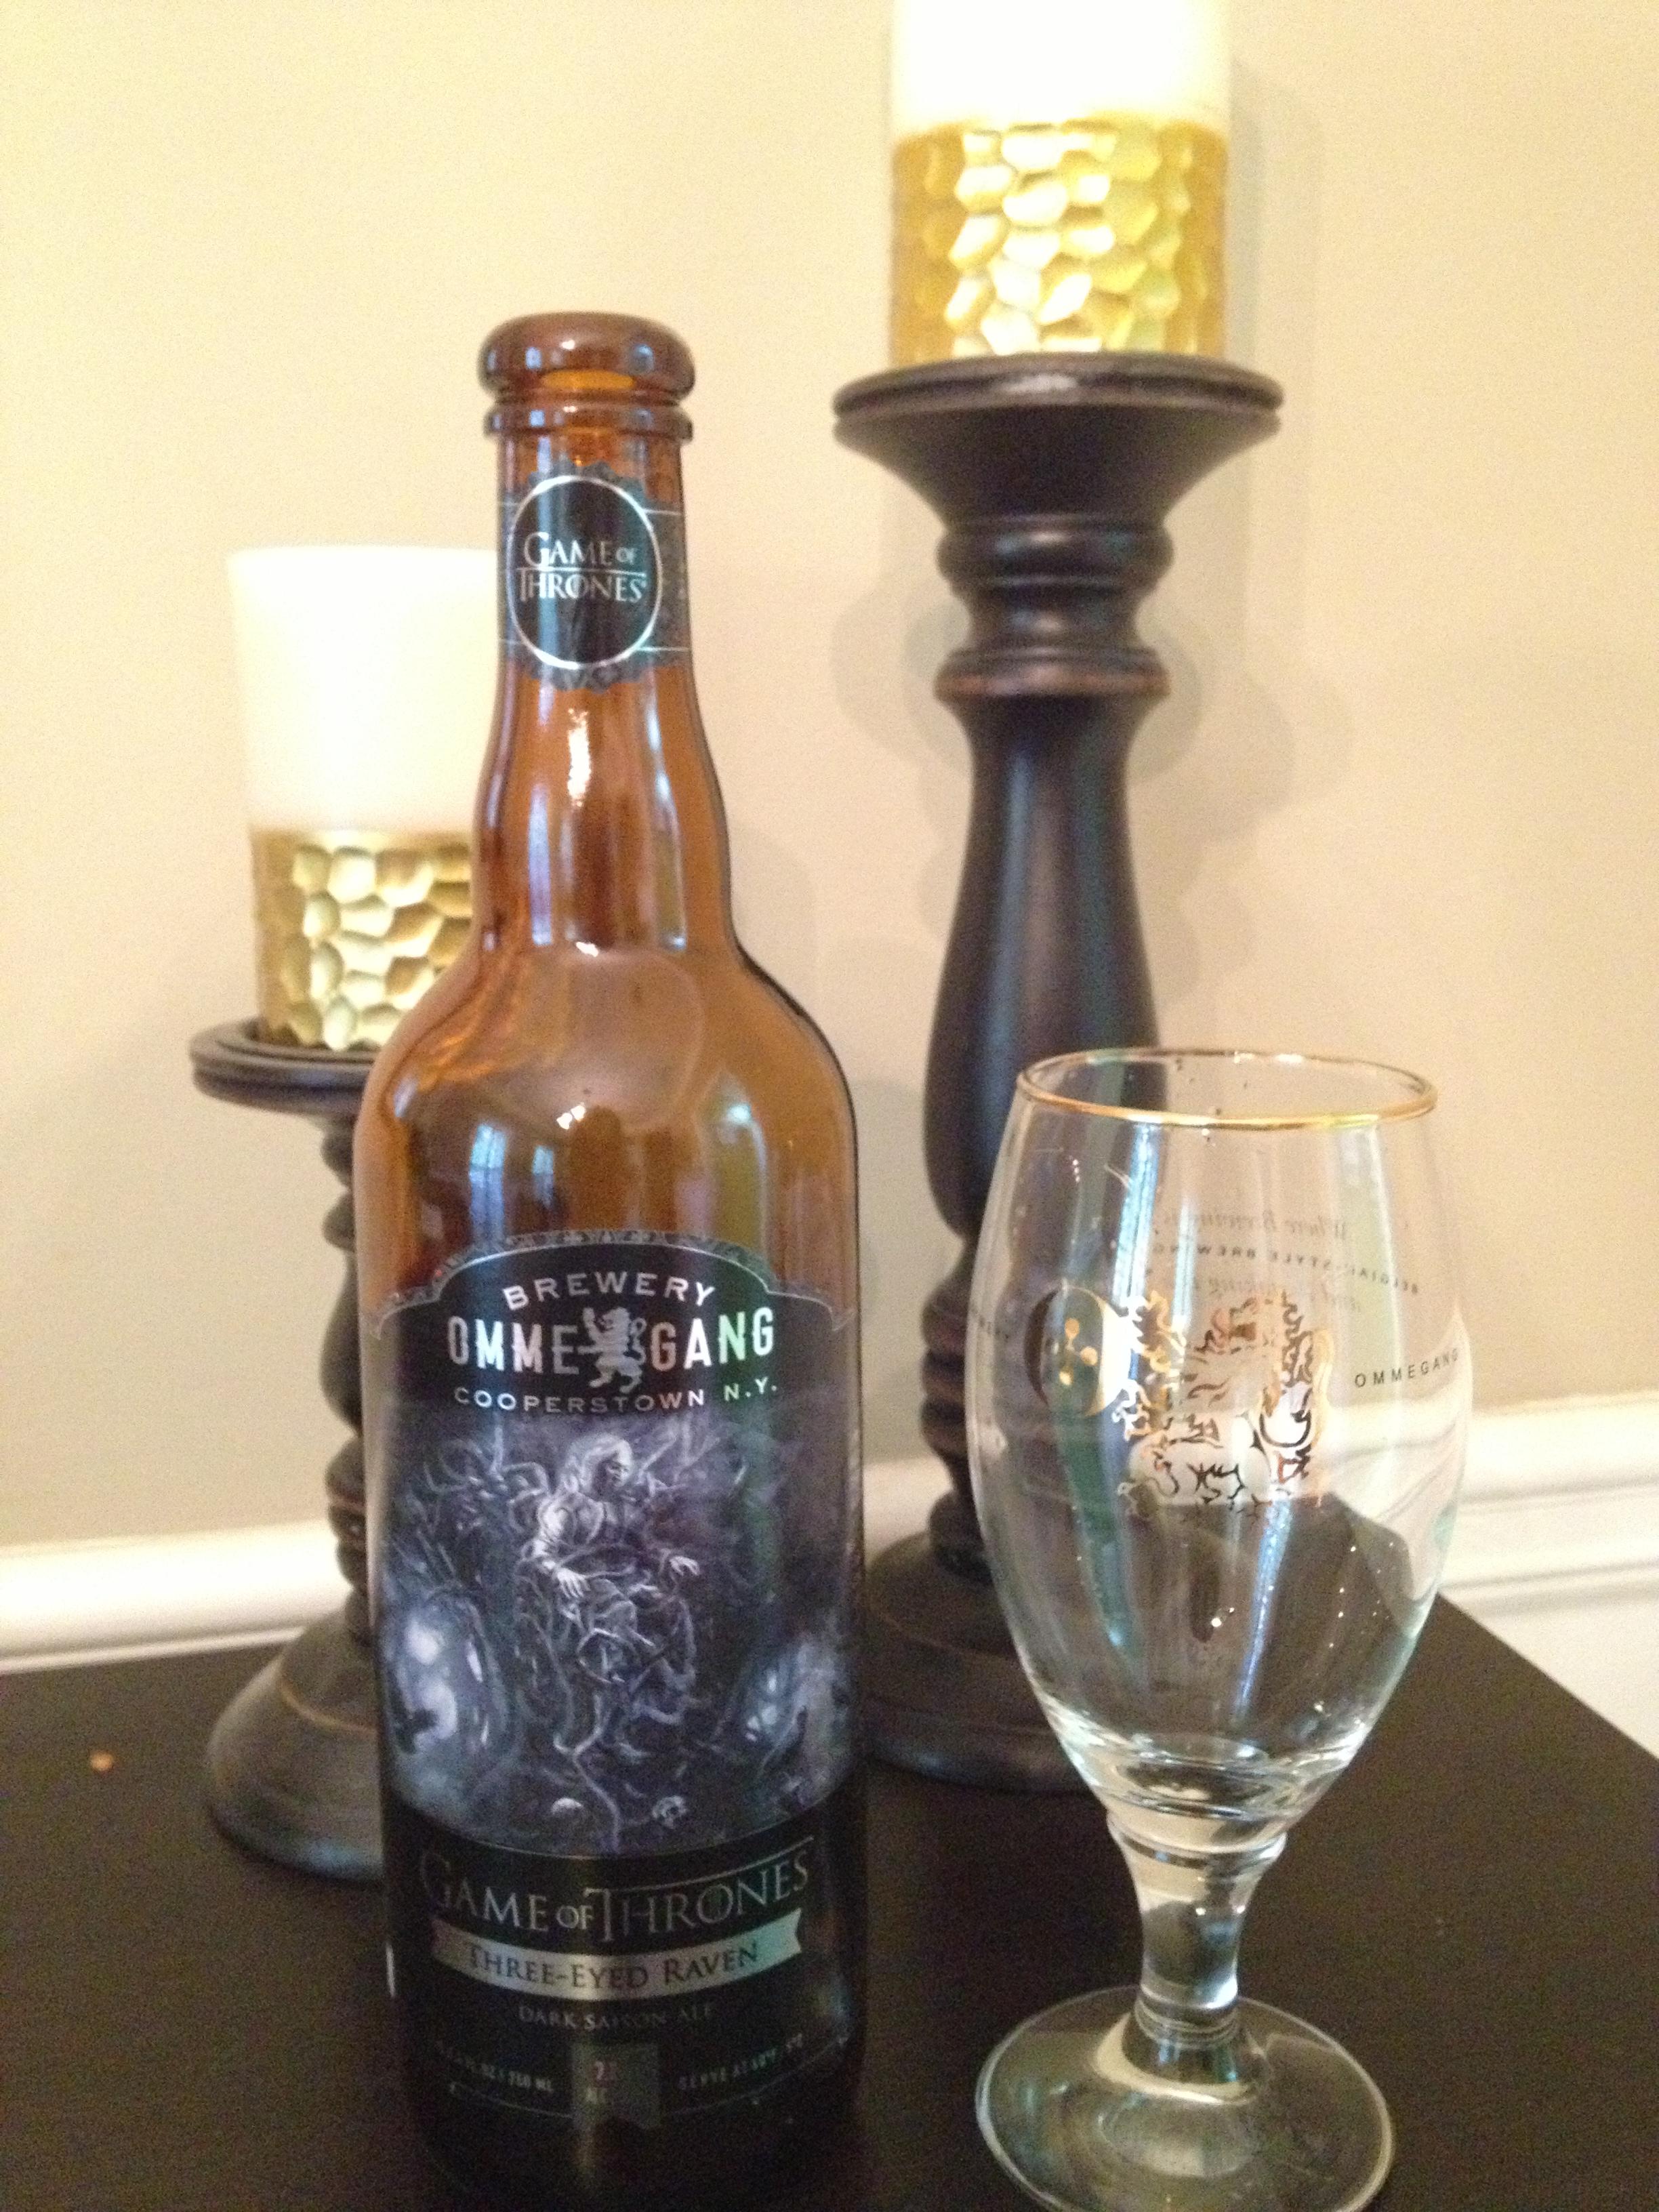 Three Eyed Raven Beer